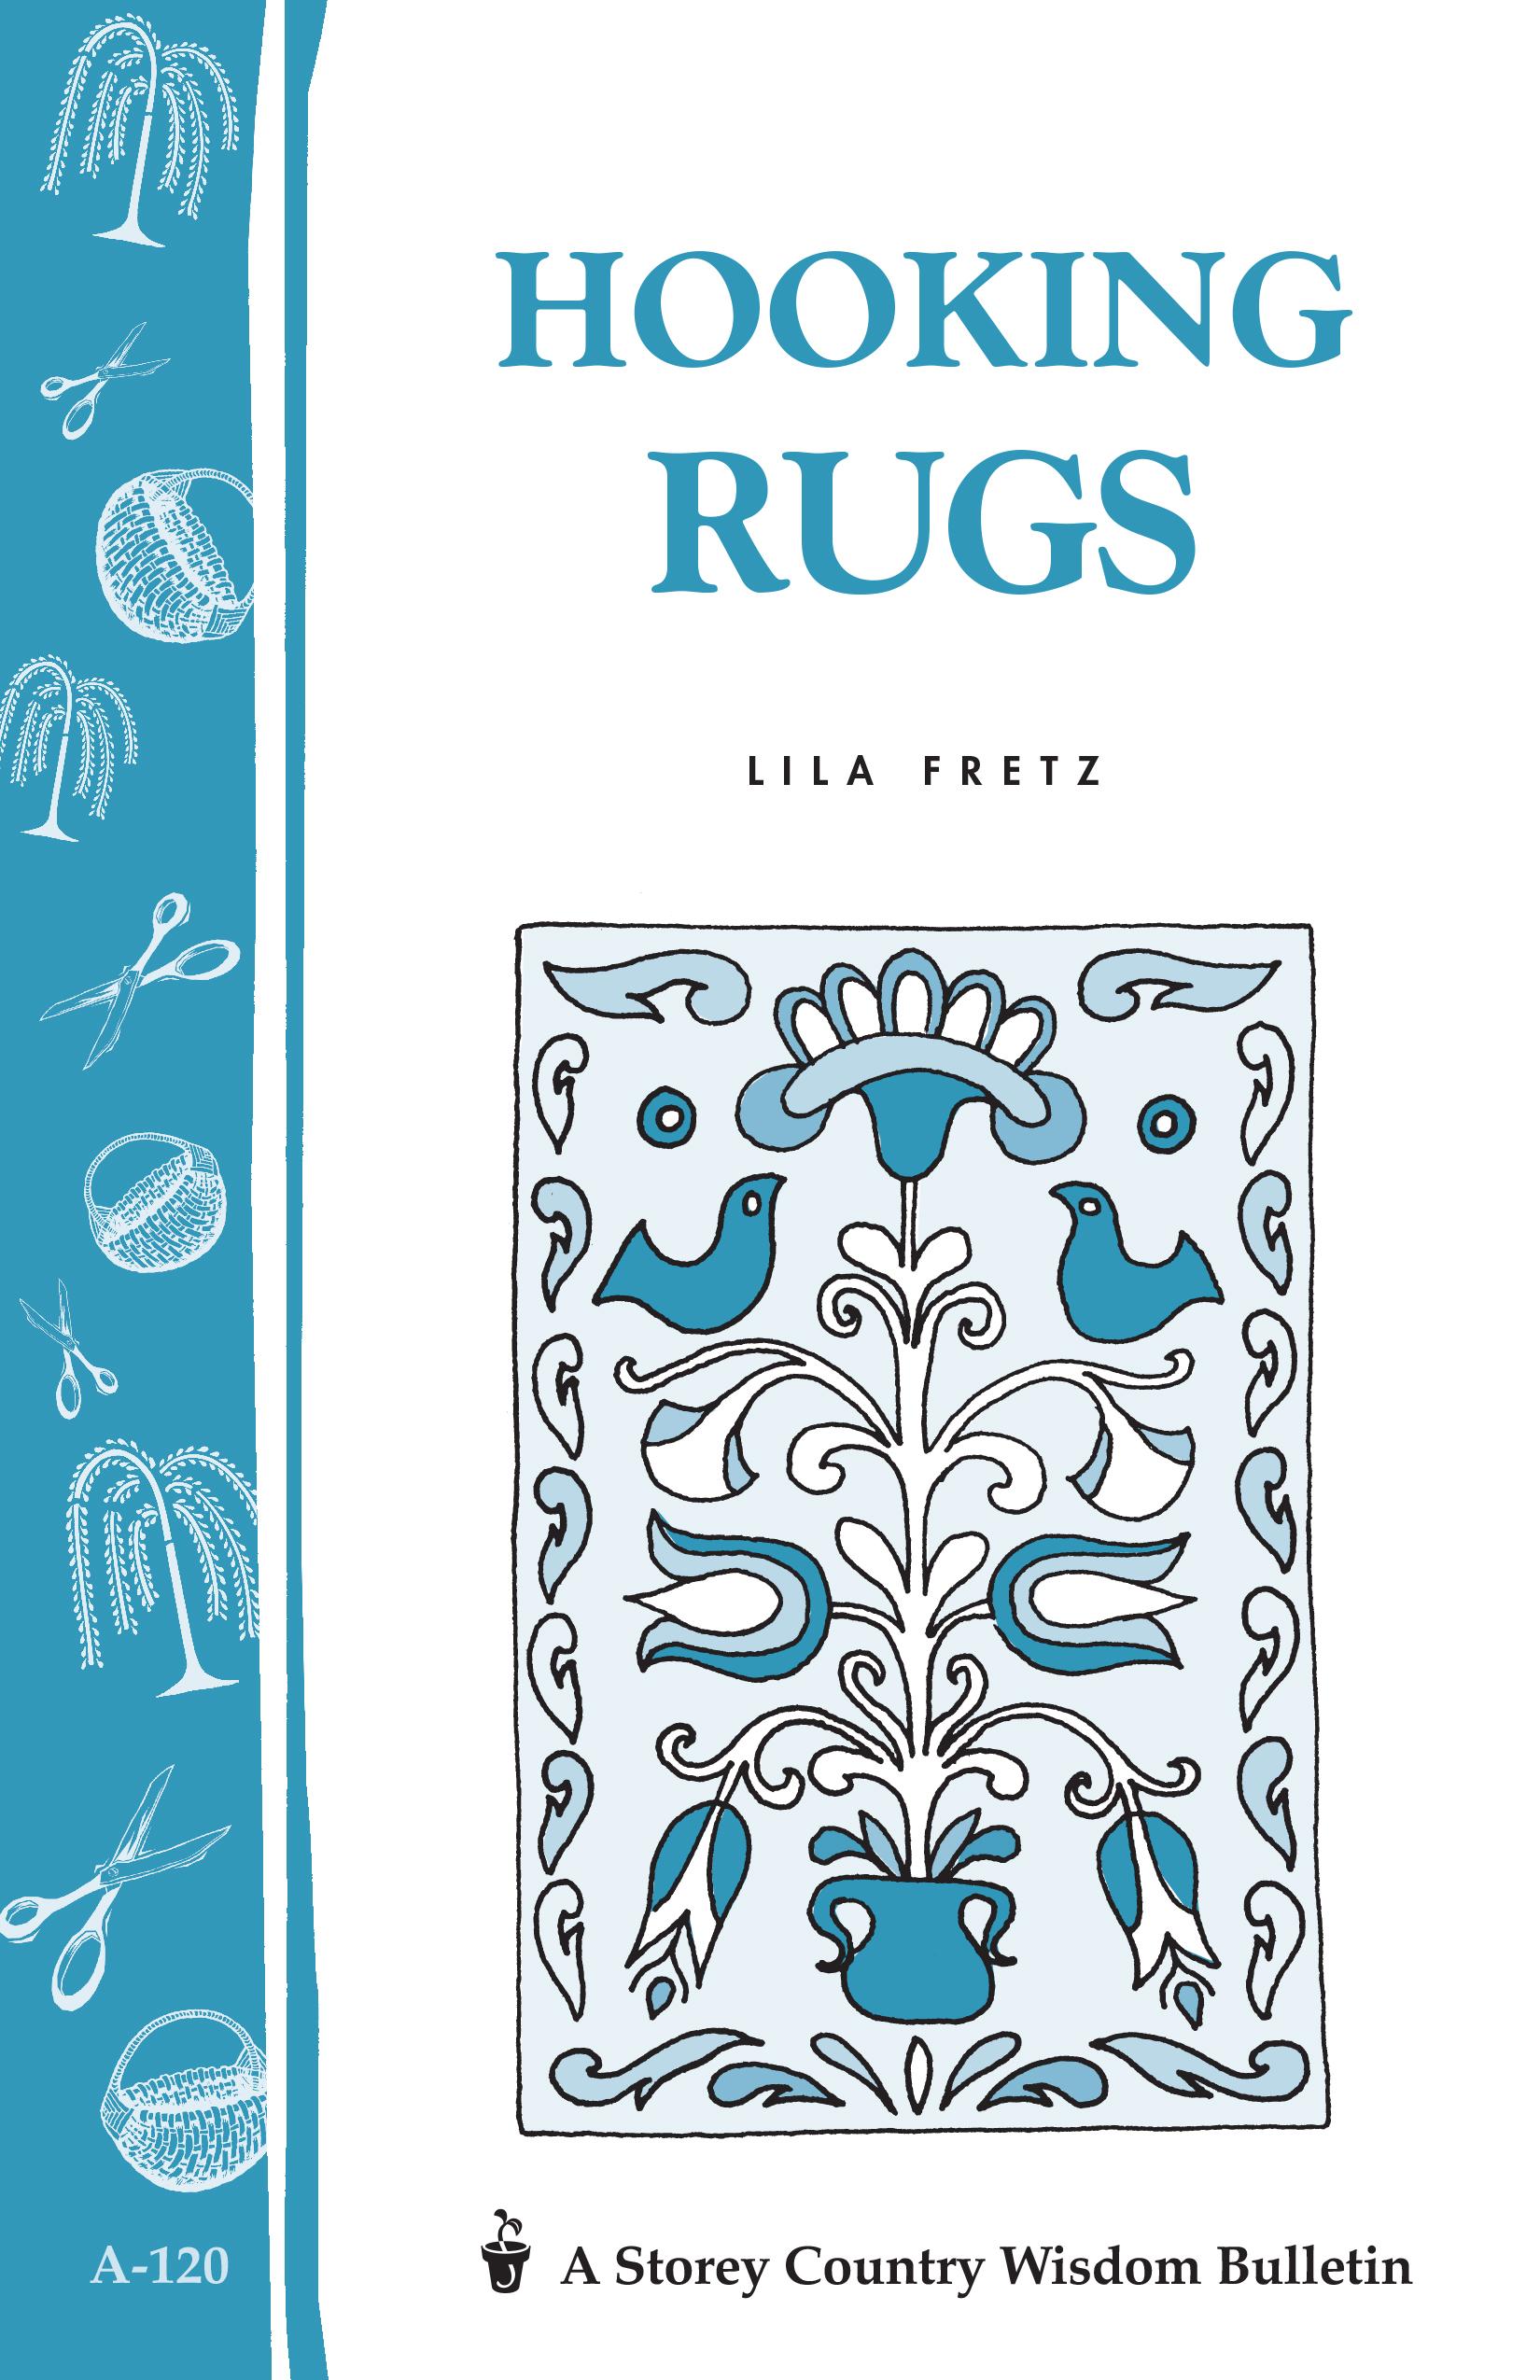 Hooking Rugs Storey's Country Wisdom Bulletin A-120 - Lila Fretz